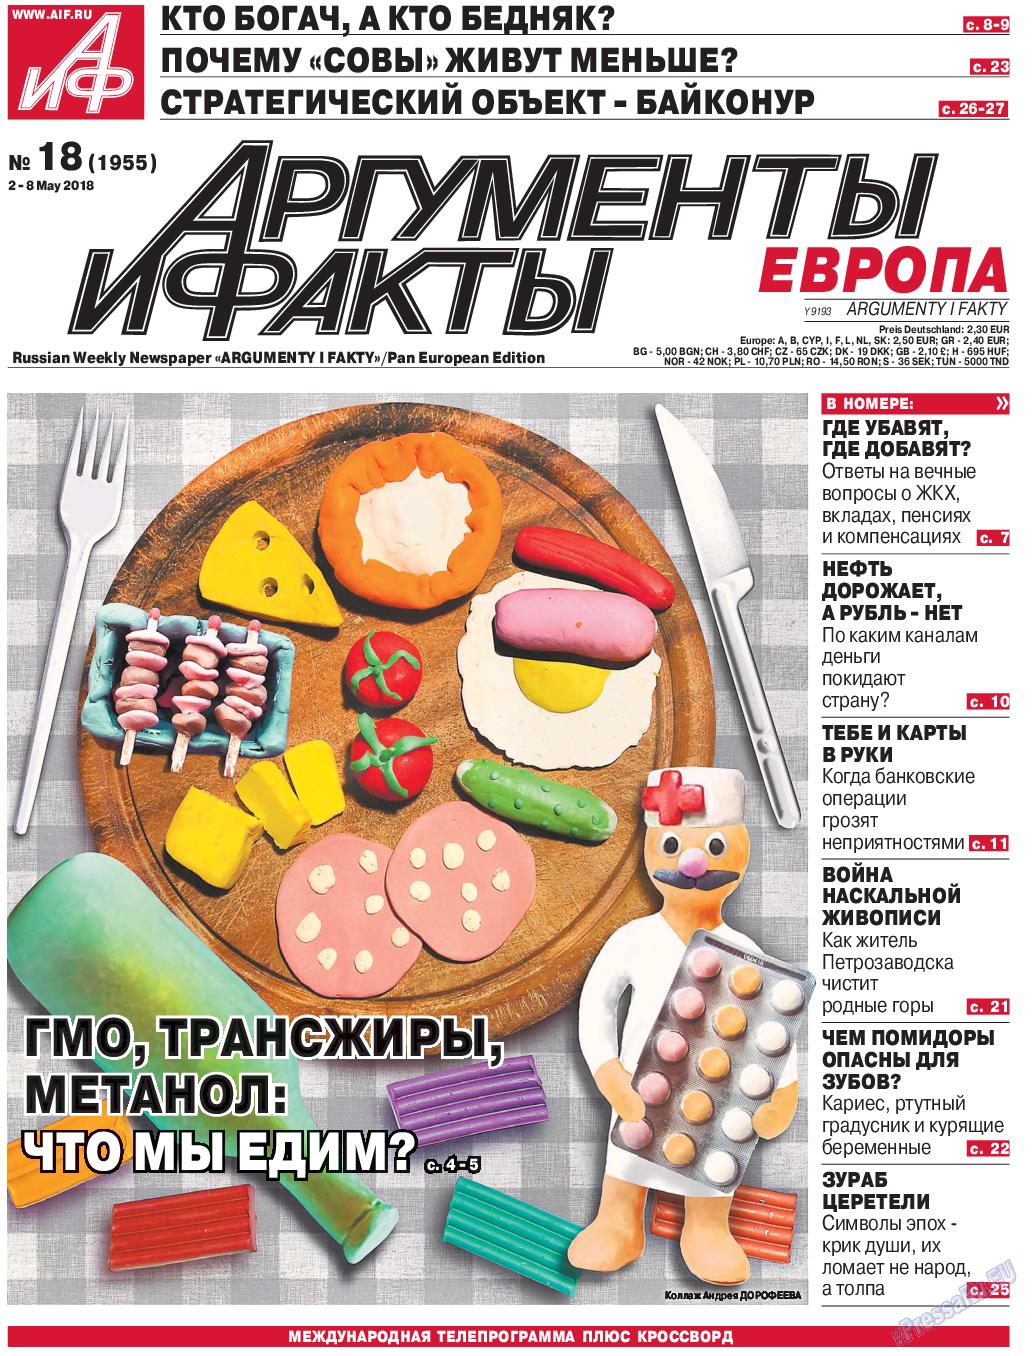 Аргументы и факты Европа (газета). 2018 год, номер 18, стр. 1